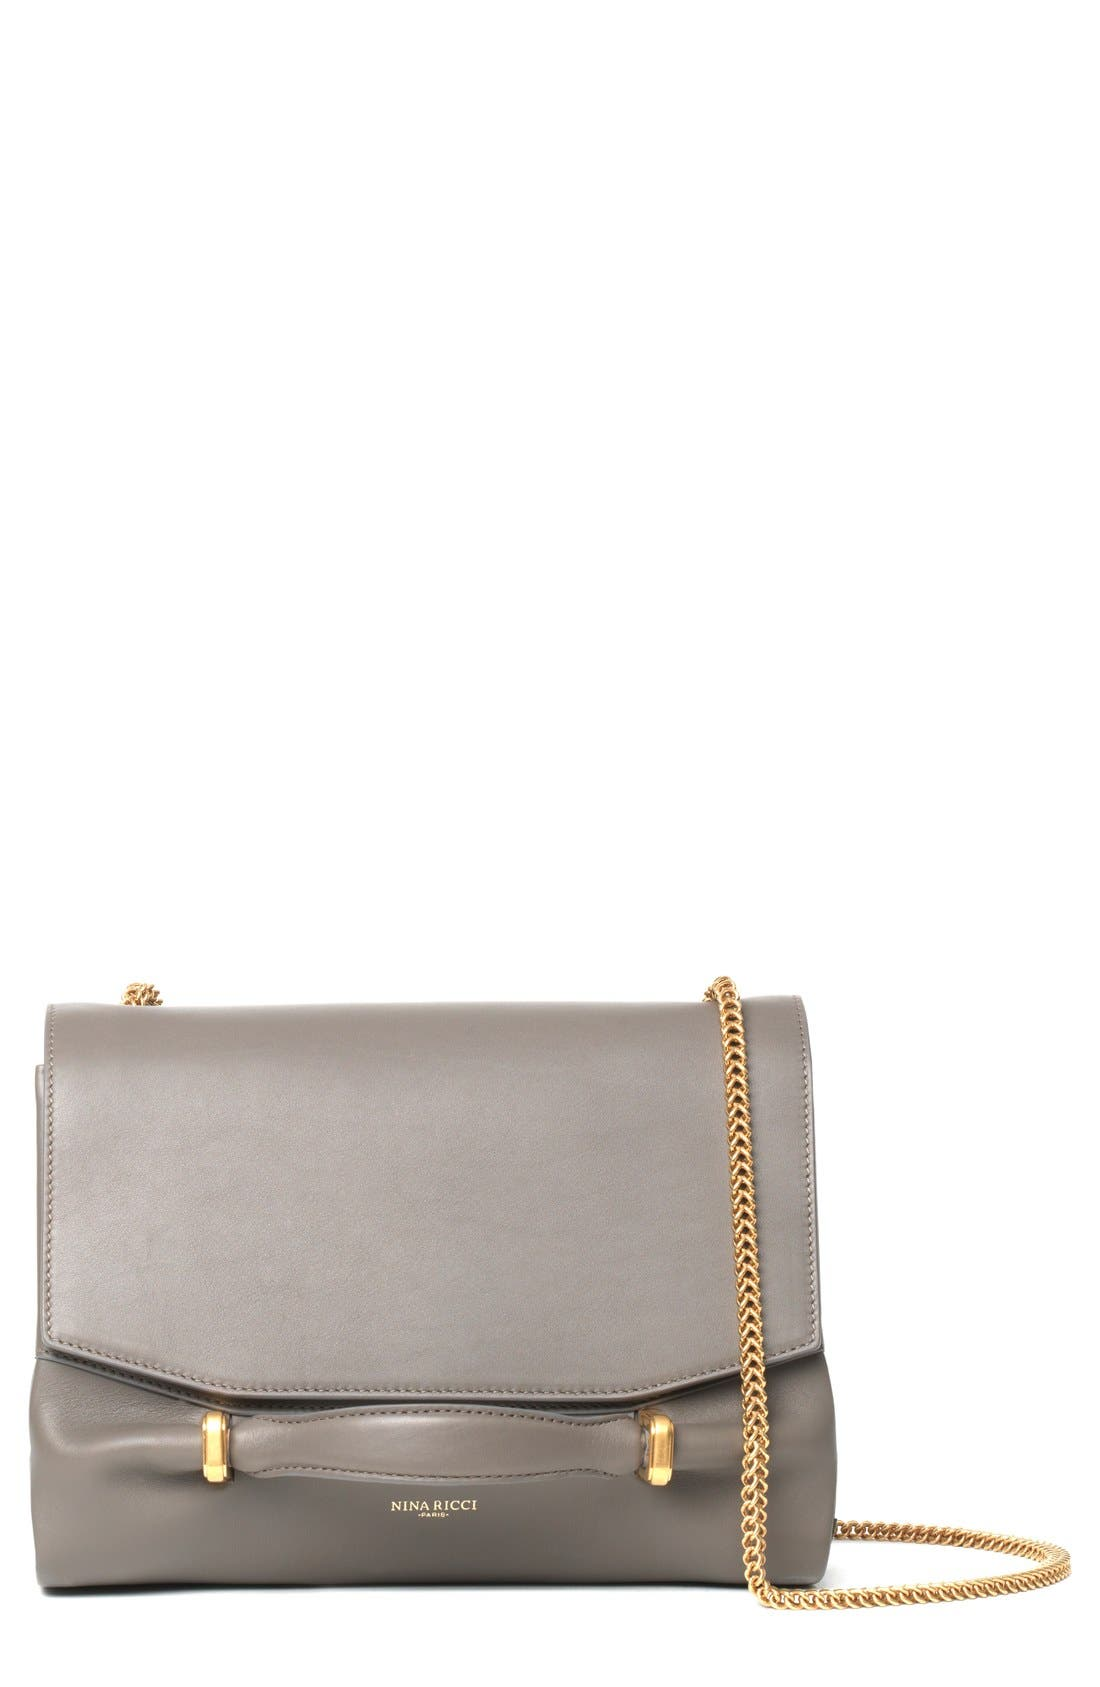 Alternate Image 1 Selected - Nina Ricci 'Marche' Chain Shoulder Bag